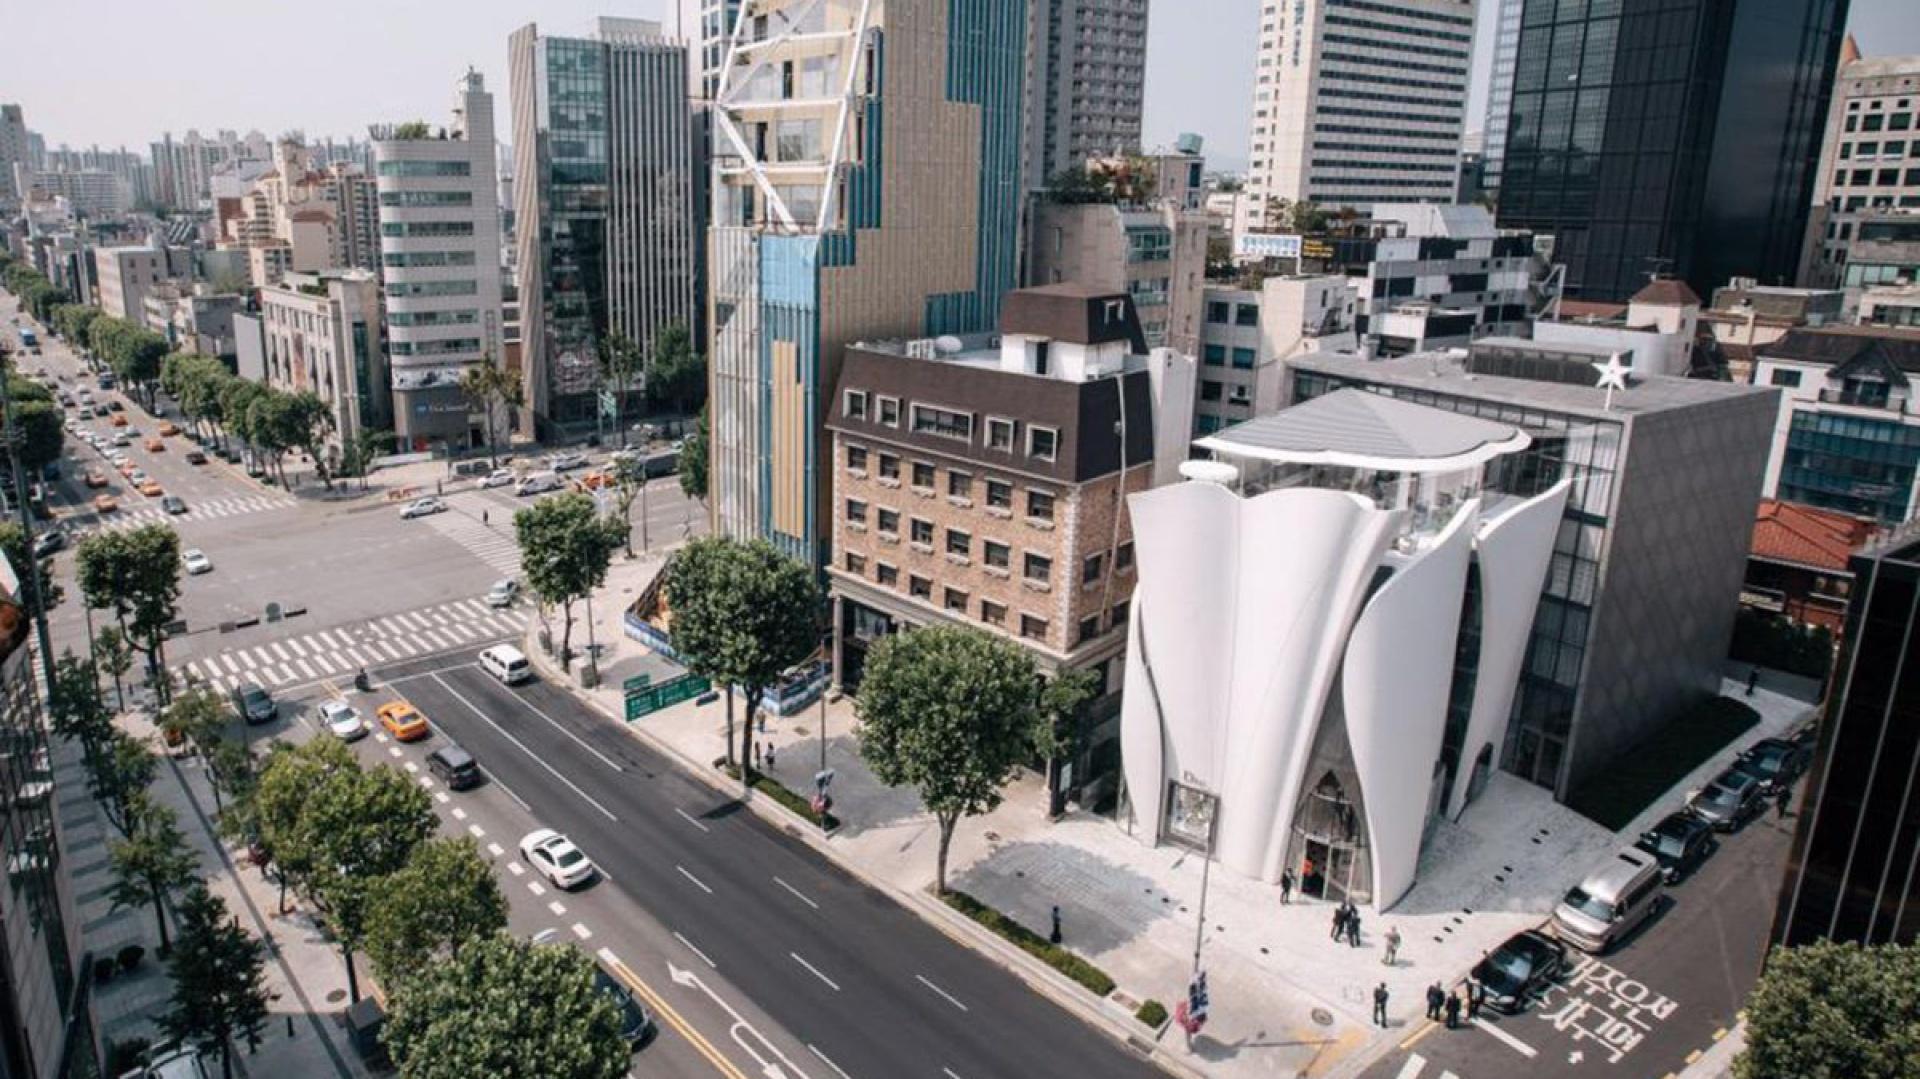 Butik Christiana Diora w Seulu. Fot. Nicolas Borel